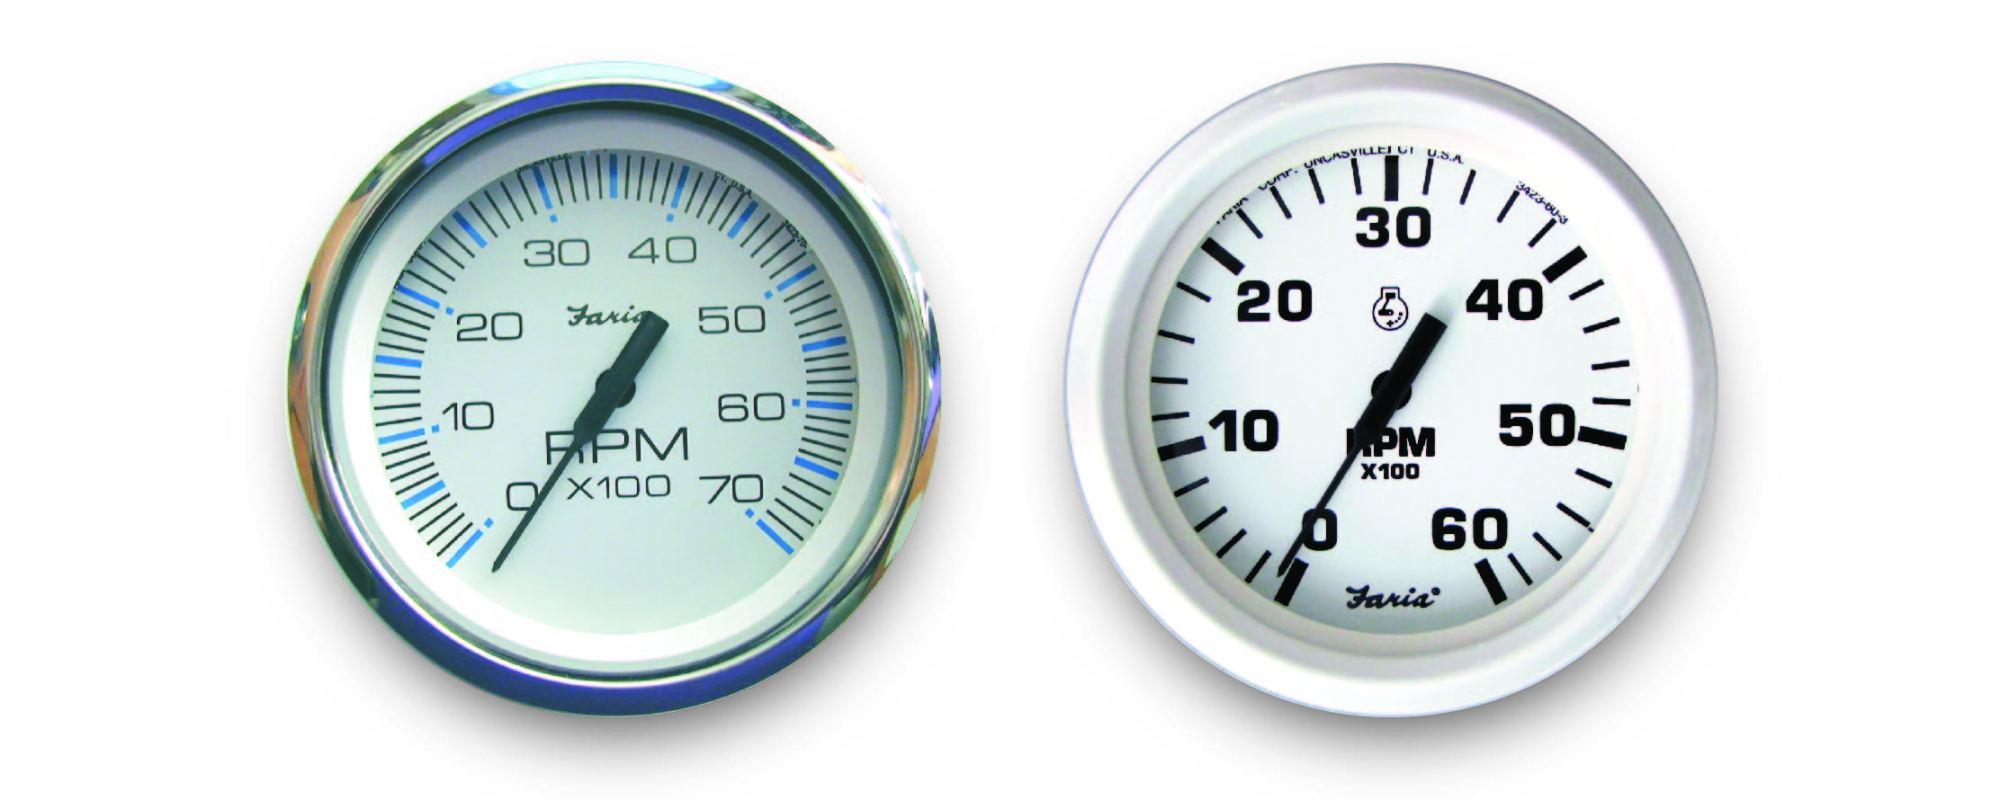 hight resolution of tachometers